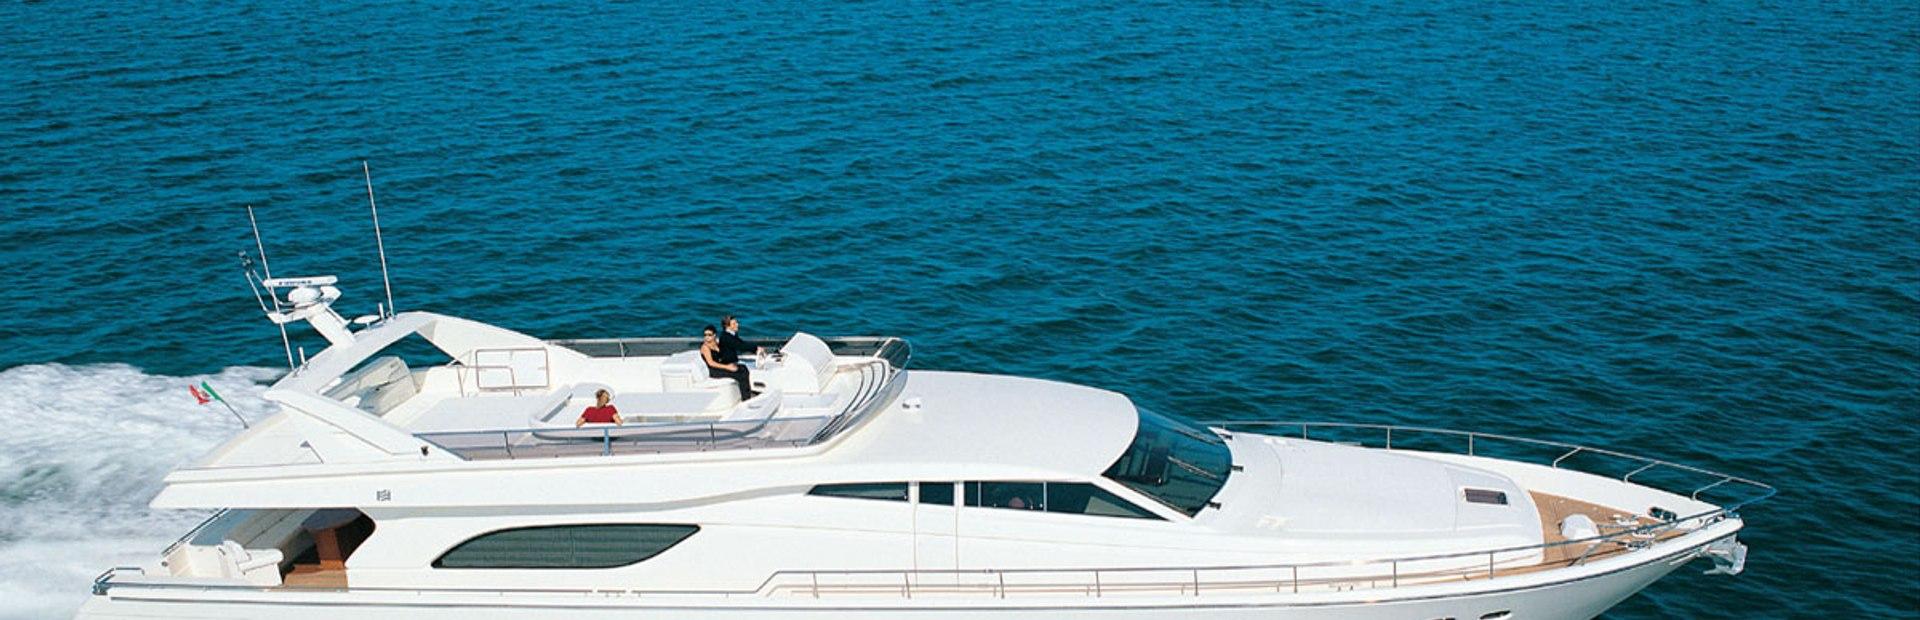 Ferretti Yachts 80 Yacht Charter